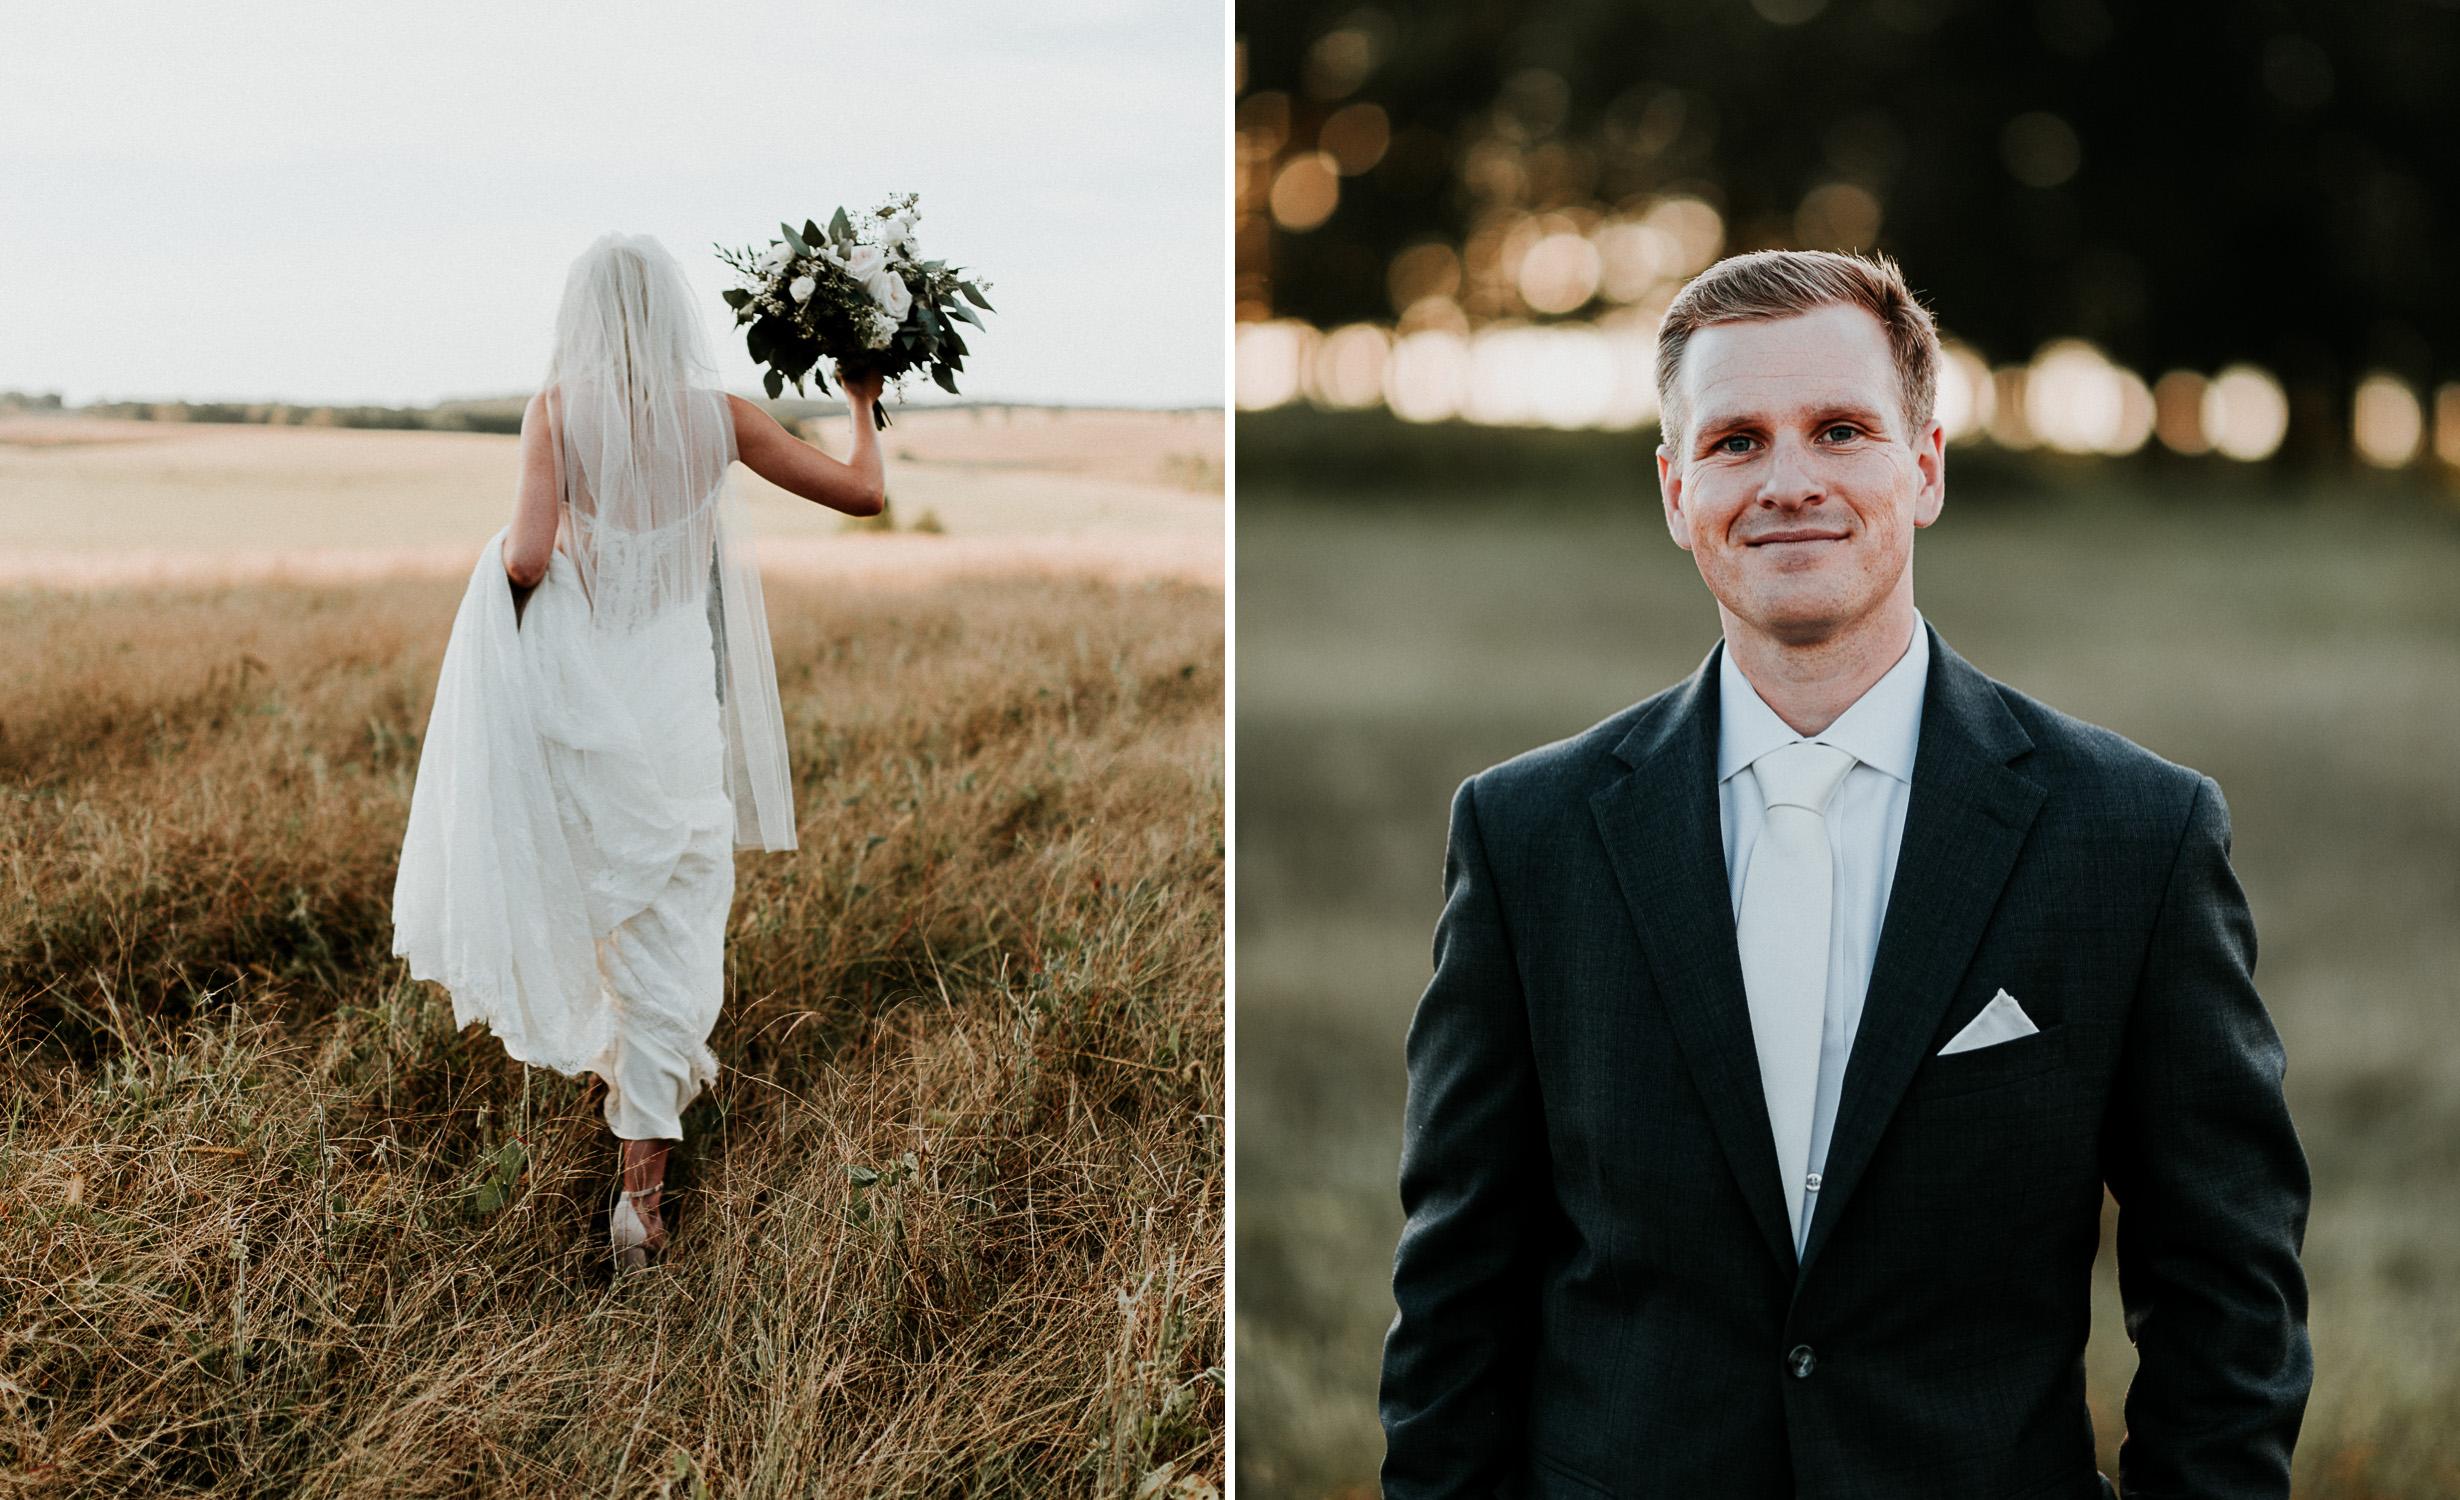 Zach&Rosalie St. Louis Wedding Photographer 9.jpg